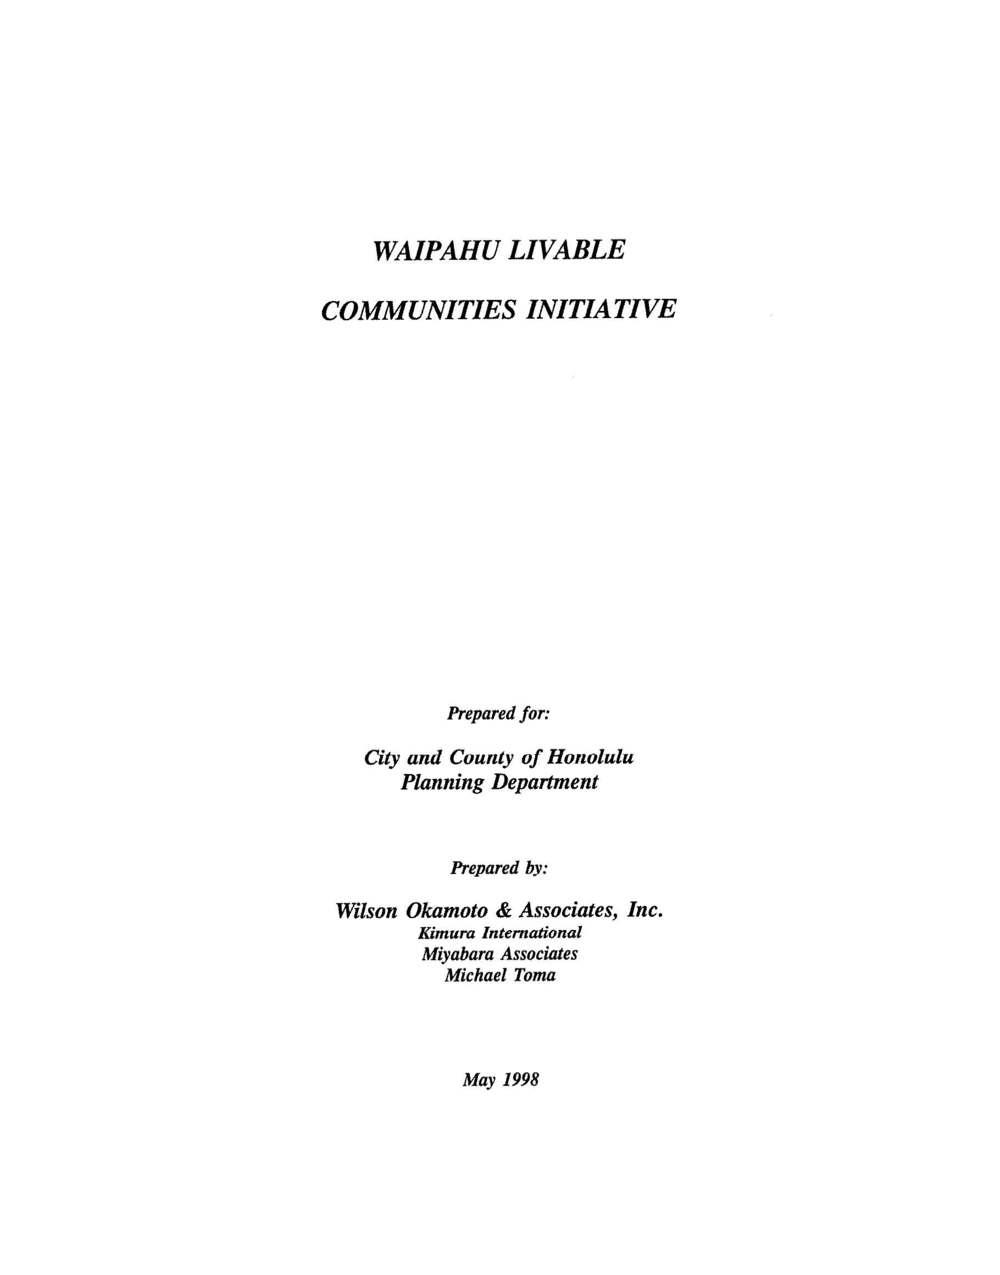 160531_WaipahuLivableCommunities(1998)_Page_002.jpg